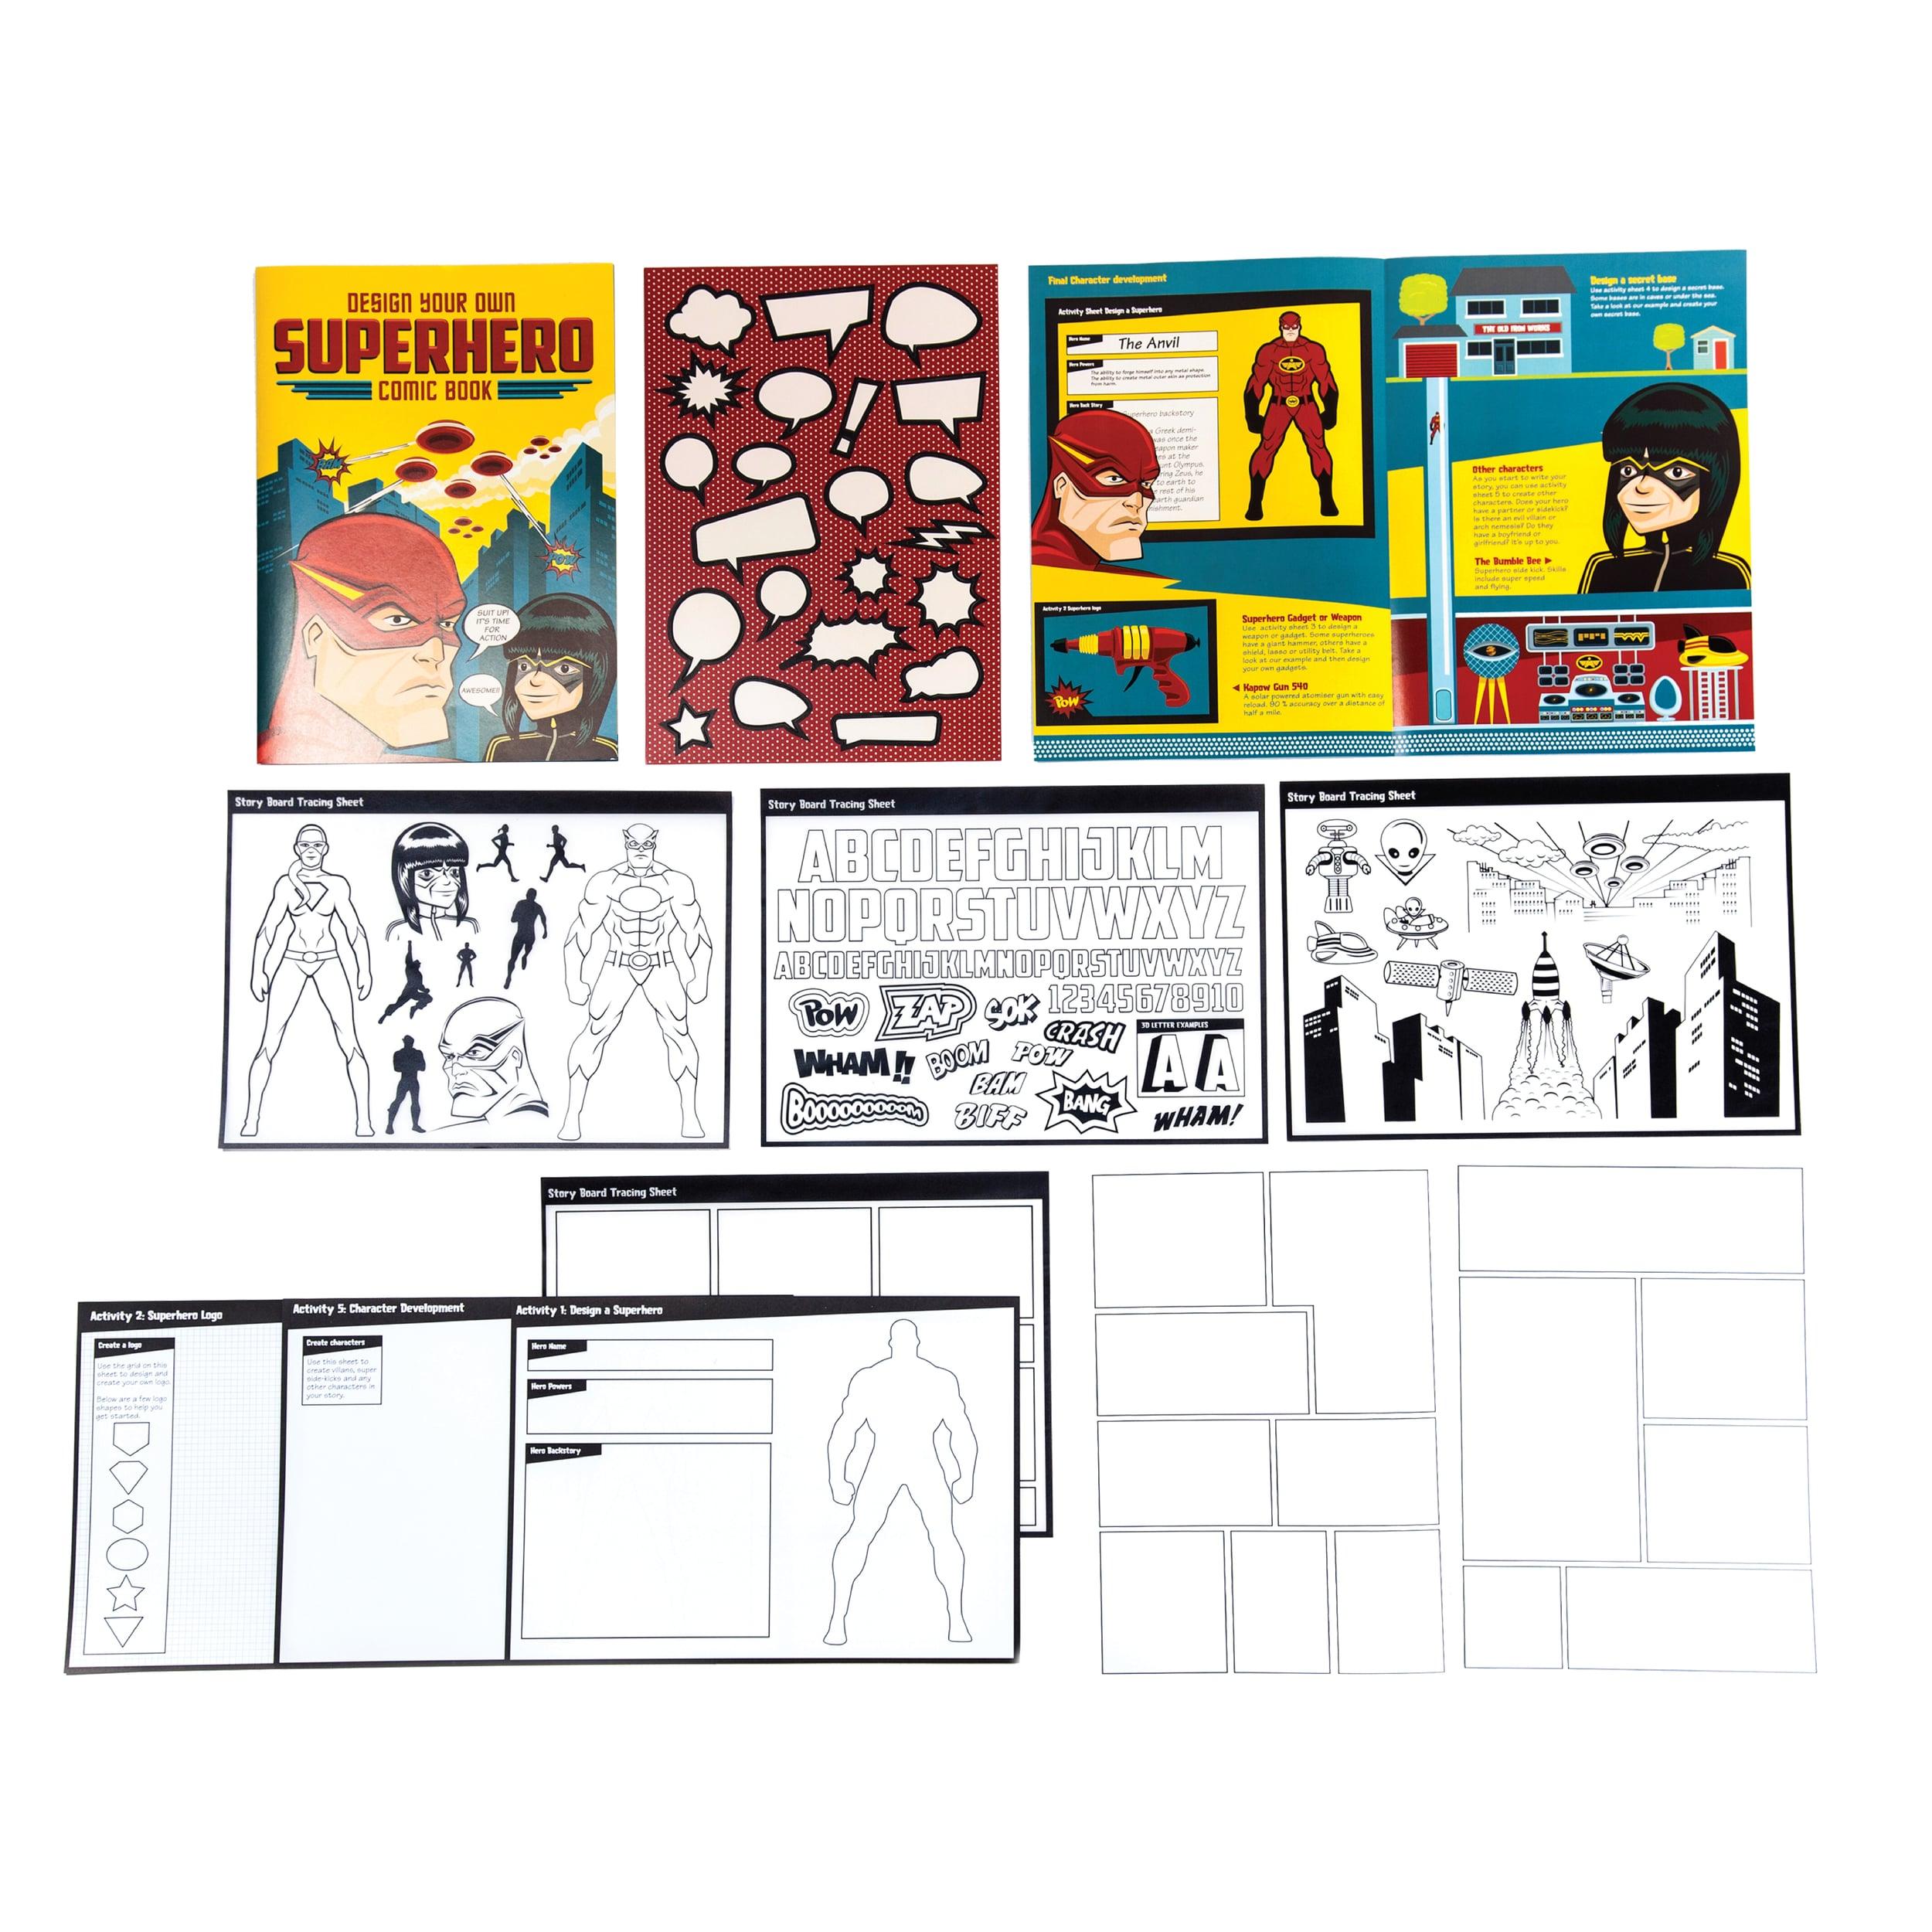 Create-a-superhero-comicbook-05.jpg